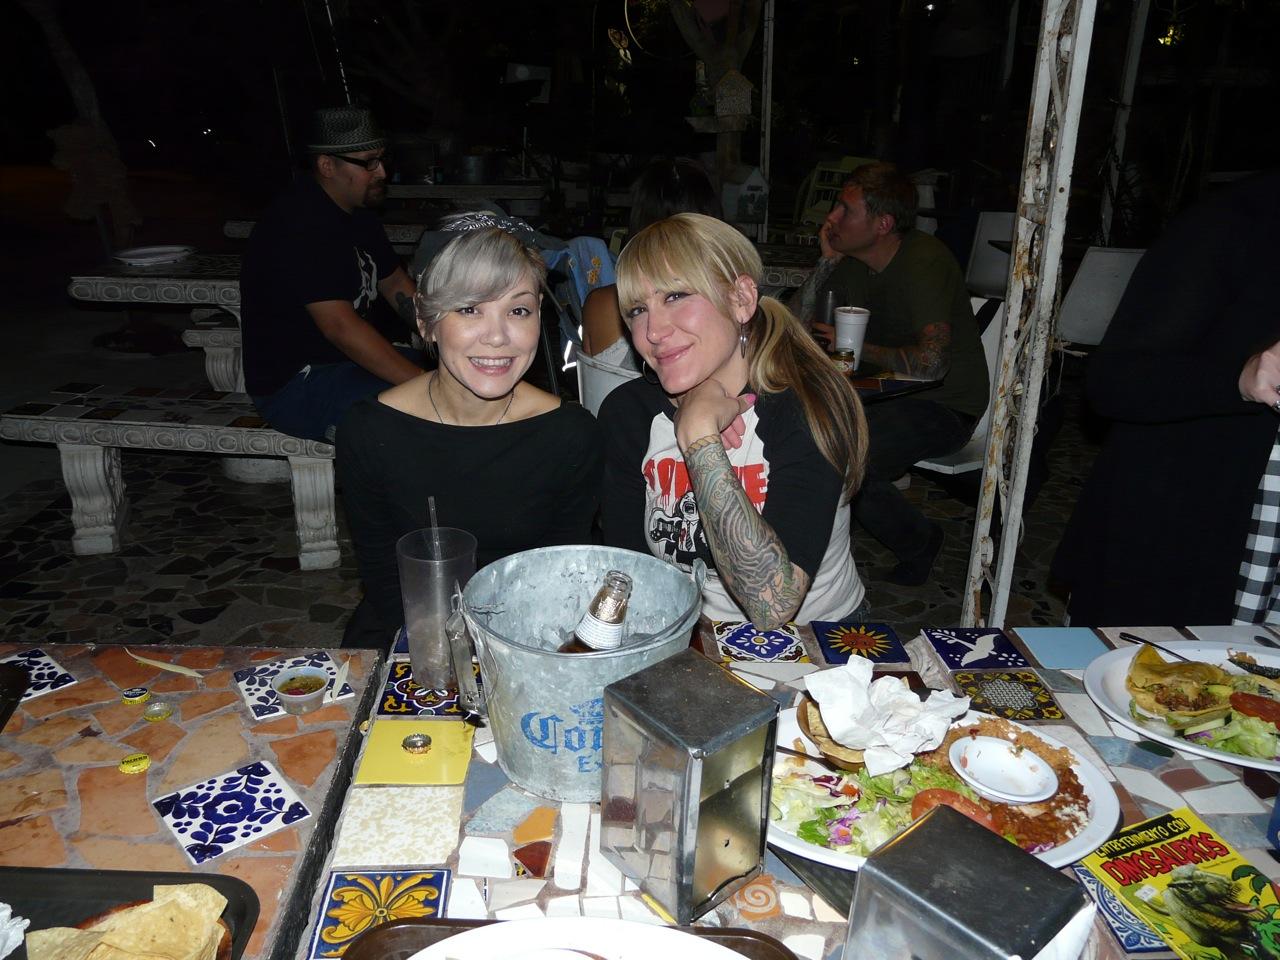 Liz McGrath & Tara McPherson